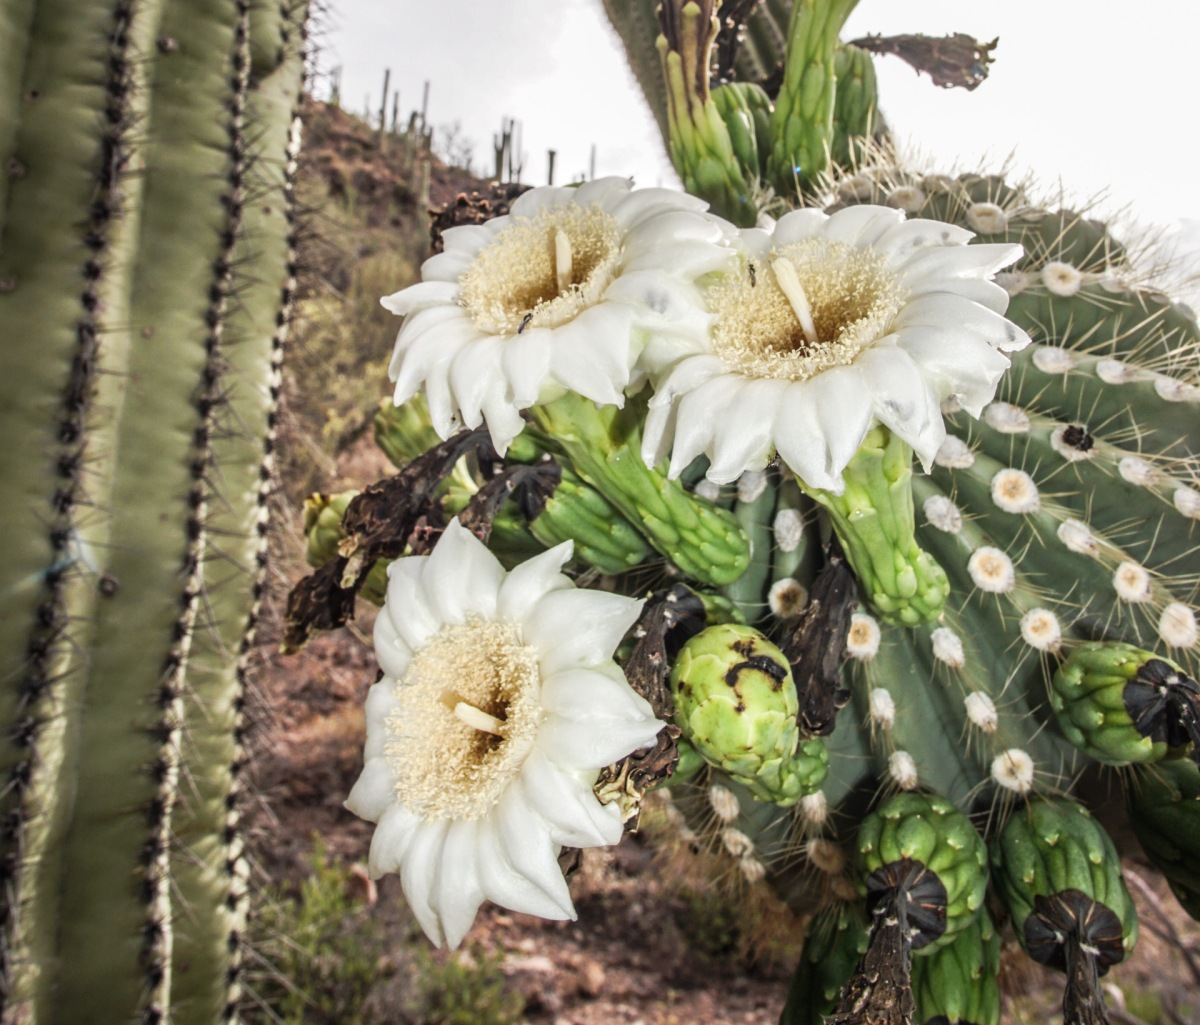 Crazy Cacti: Saguaros & Sonoran Desert—Southeast Arizona ... on crazy house architecture, crazy house tree, crazy house car, crazy photography, crazy house cat, crazy house fire, crazy house paint, crazy bird, crazy house book, crazy house animals, crazy sports, crazy house history, crazy house design, crazy house art, crazy patio, big ears plant, crazy house texas, crazy house people, crazy apple,